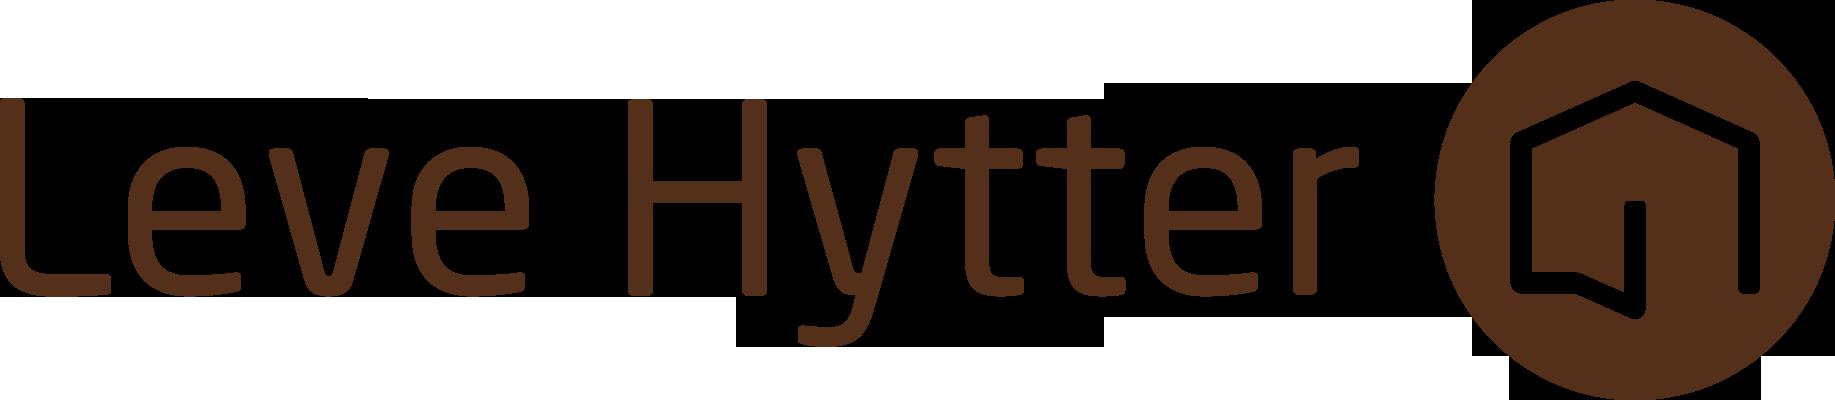 LEVE HYTTER AS